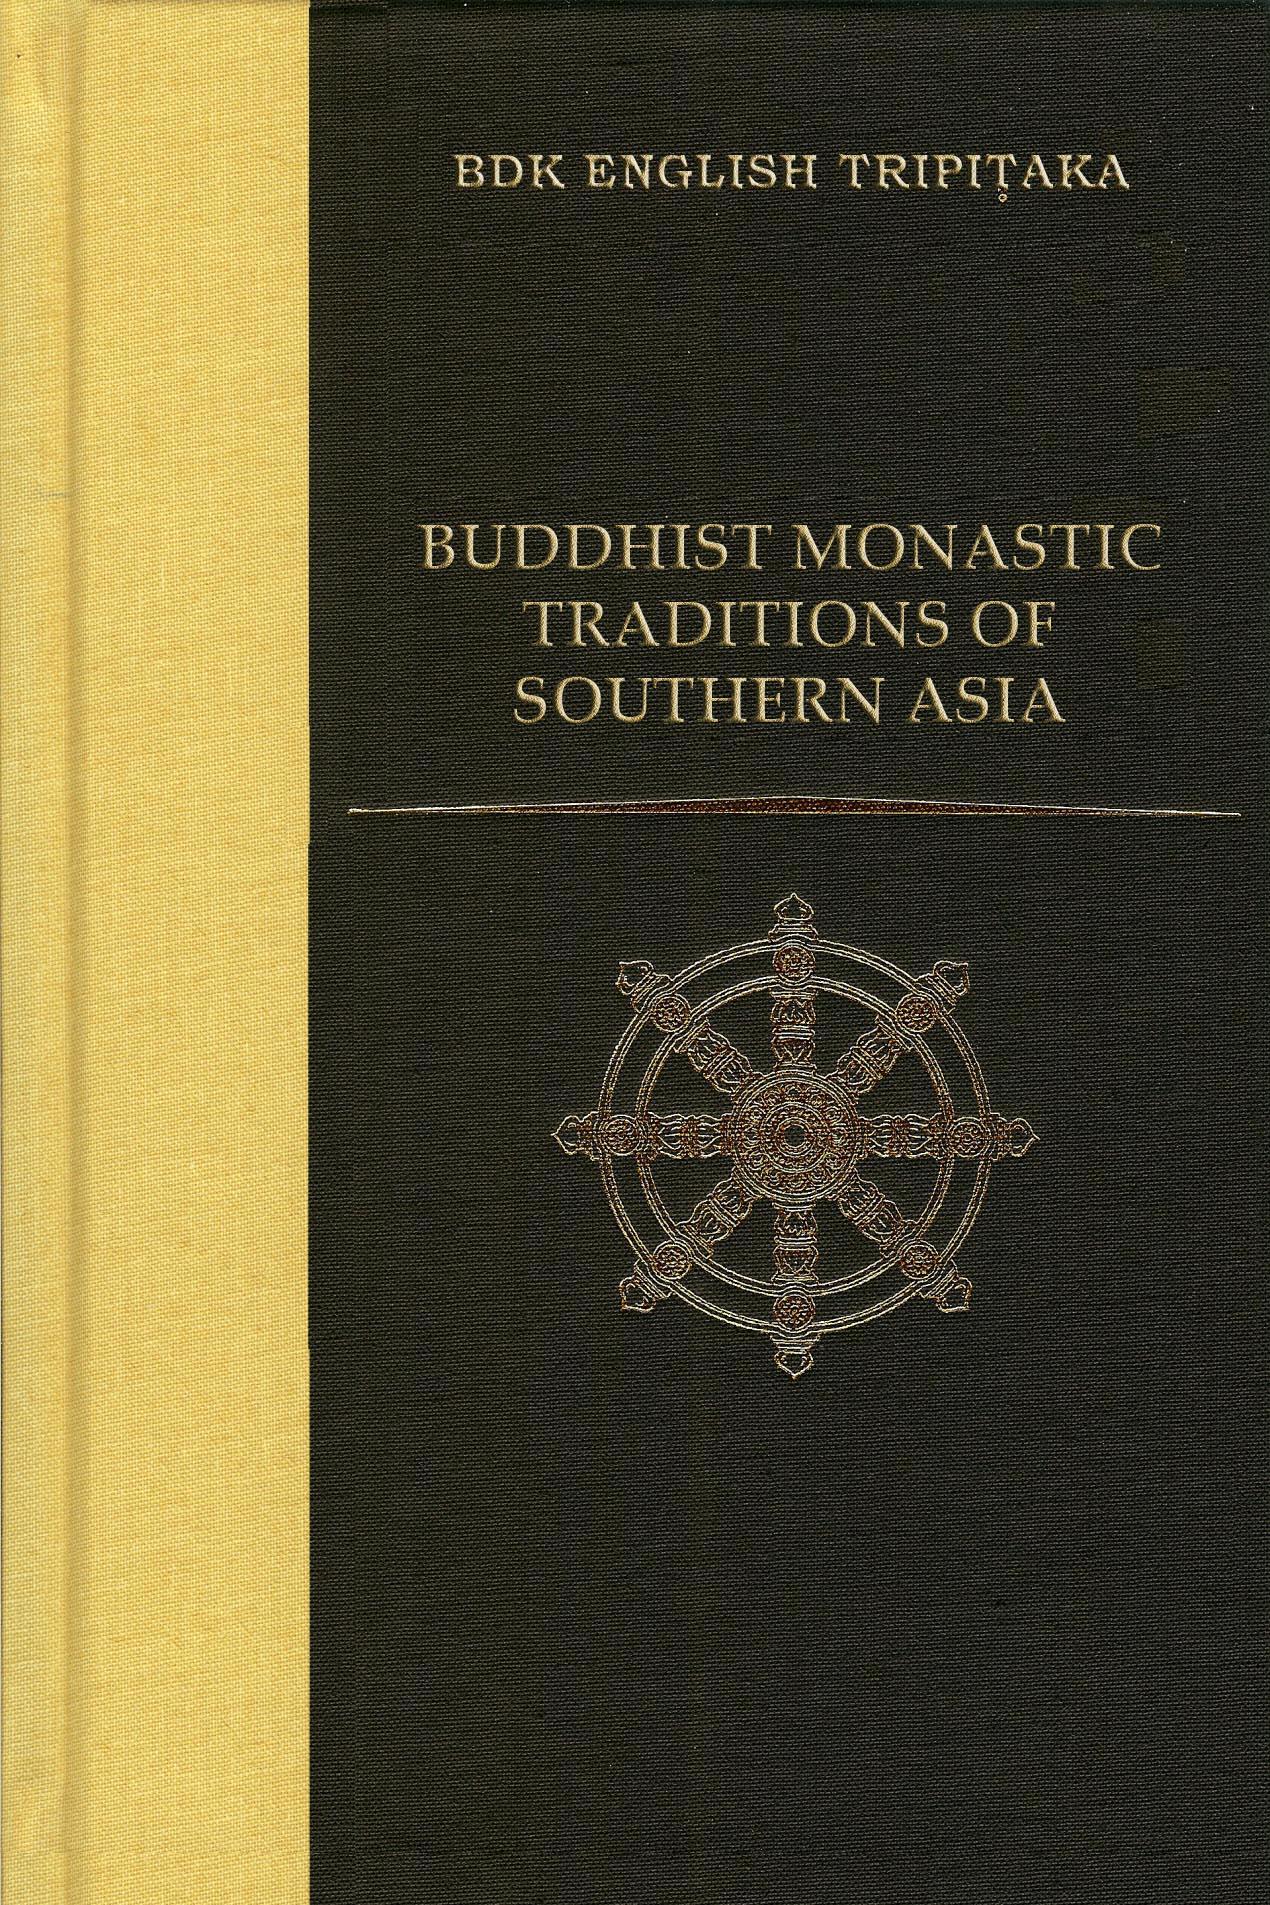 Rongxi Buddhist Monastic Traditions cover art